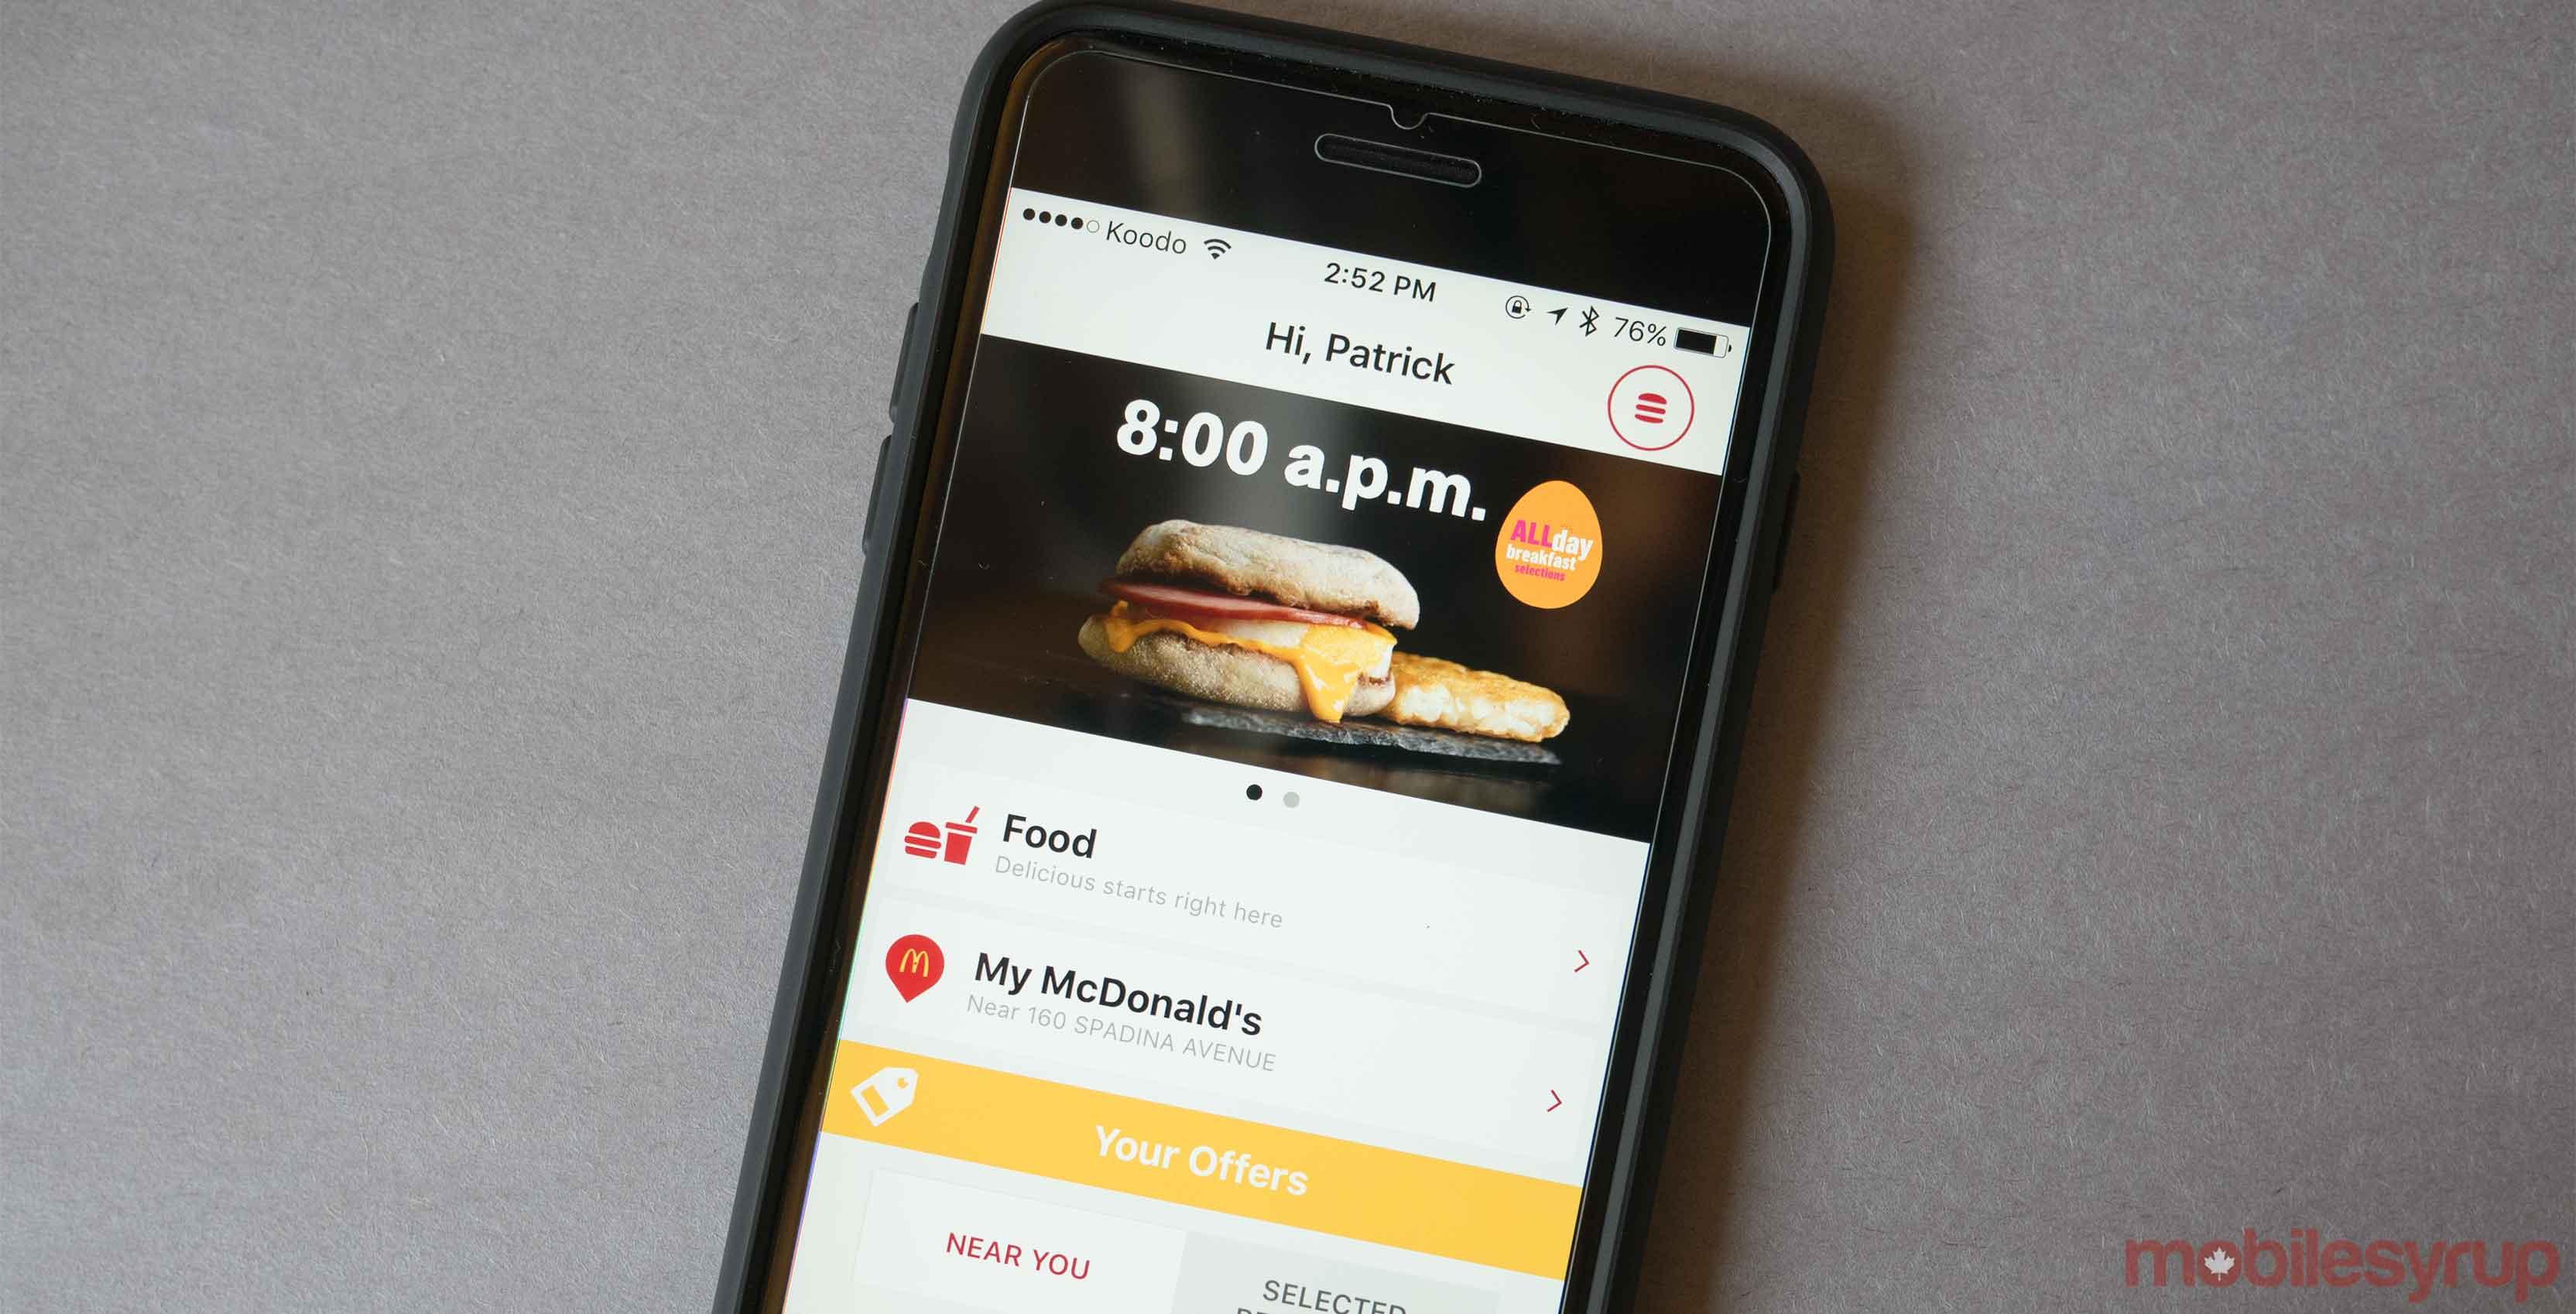 McDonalds phone app